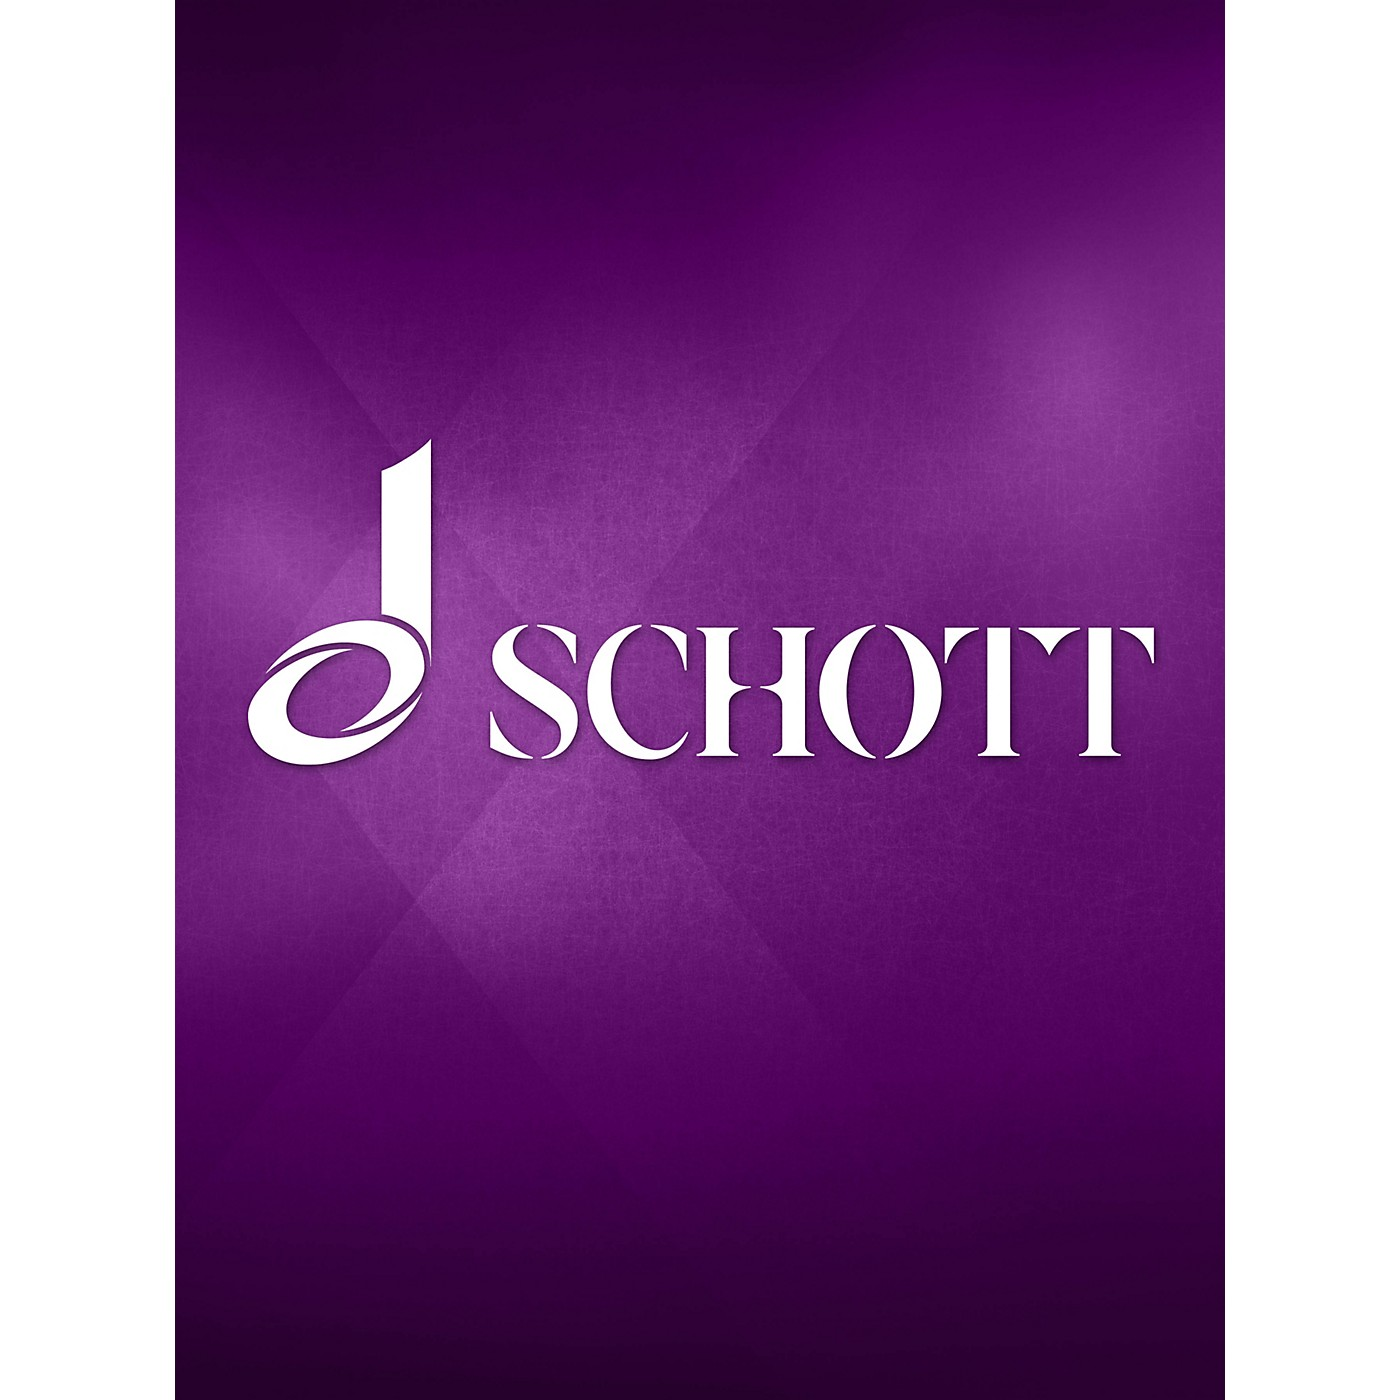 Schott Spiel, Op. 39 (for Wind Band - Set of Parts) Schott Series by Ernst Toch thumbnail